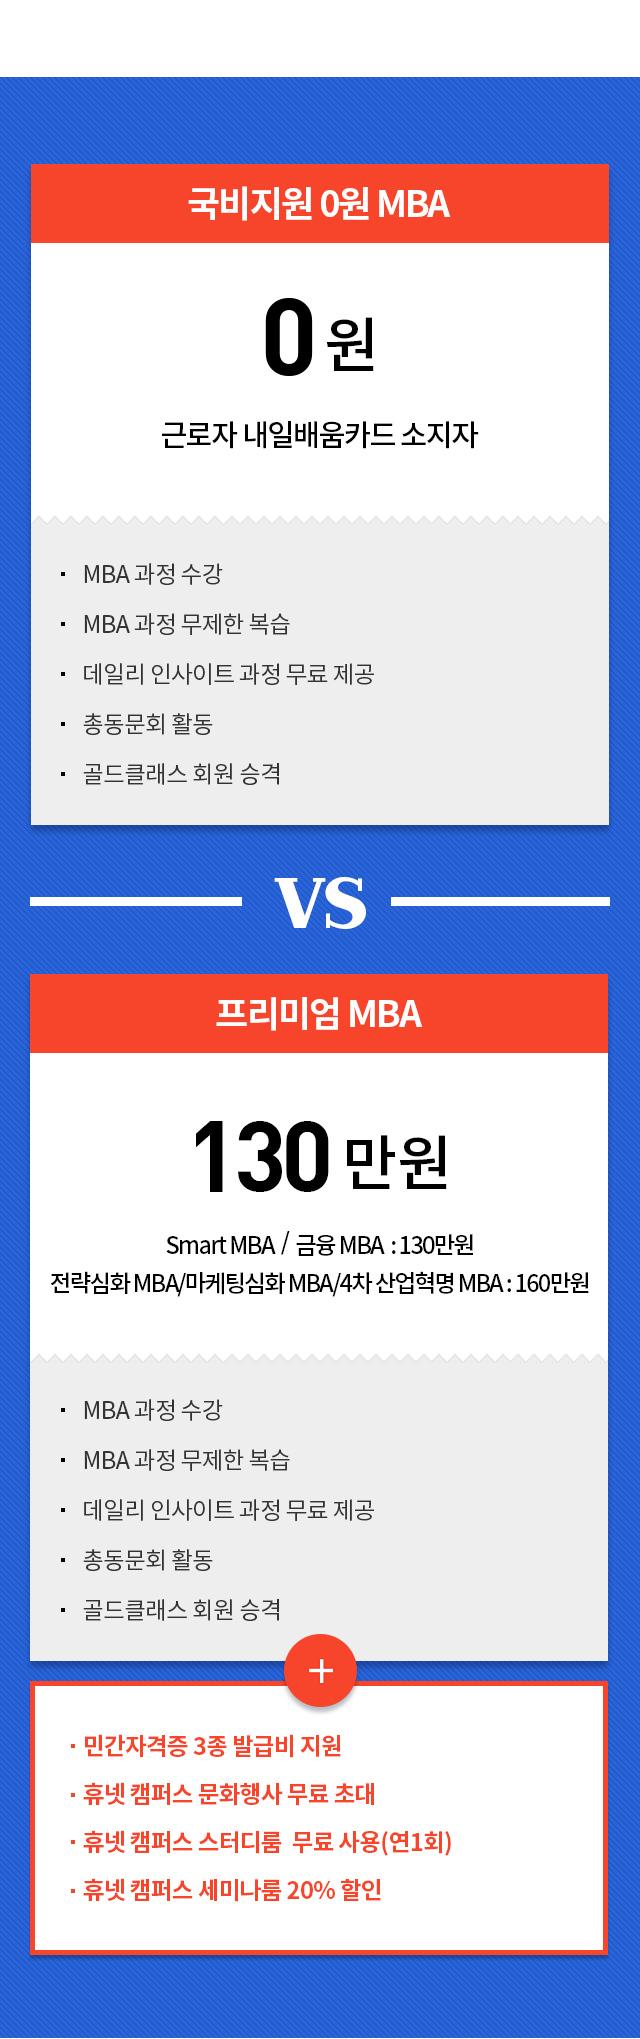 MBA 상품안내